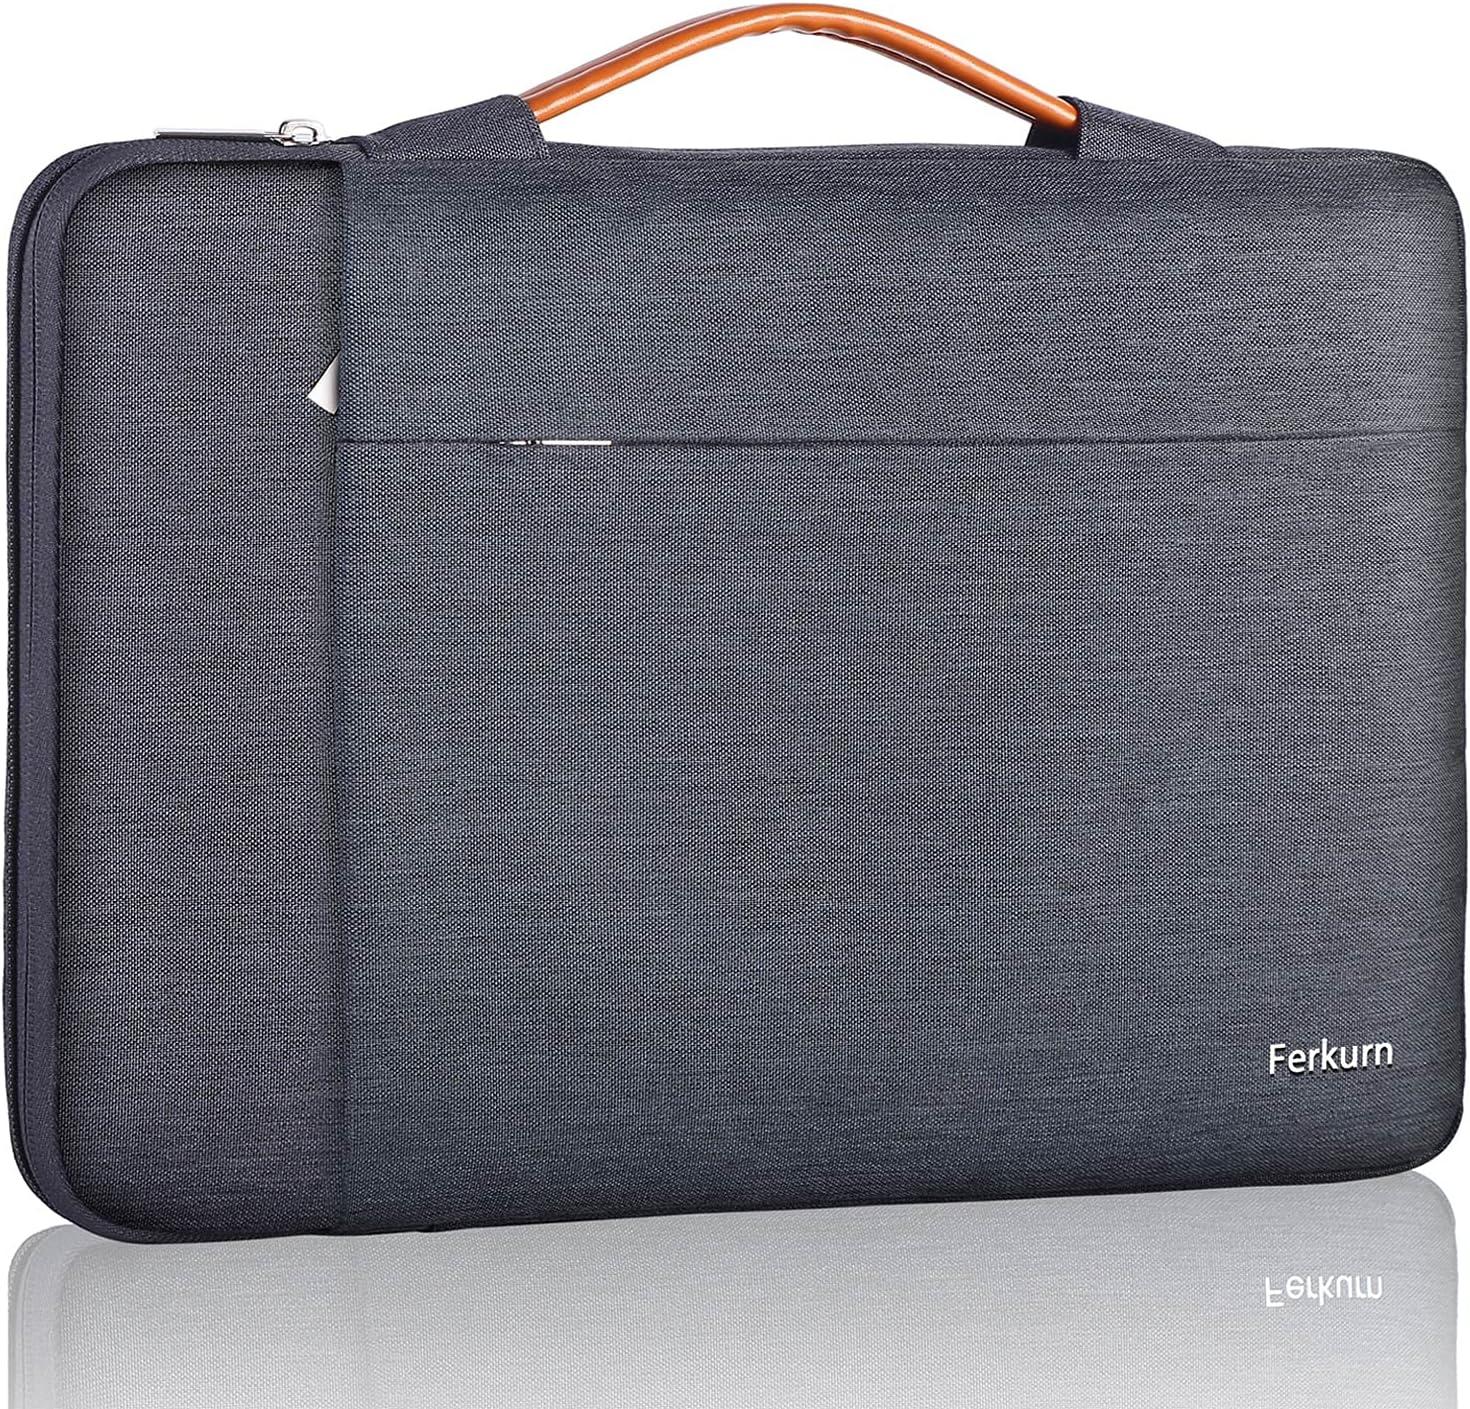 Ferkurn 14 inch Laptop Sleeve Case for Chromebook 14/ ThinkPad IdeaPad/Latitude Inspiron/Pavilion EliteBook/ZenBook VivoBook/Acer Aspire Swift 7, Waterproof Protective Laptop Computer Carrying Bag